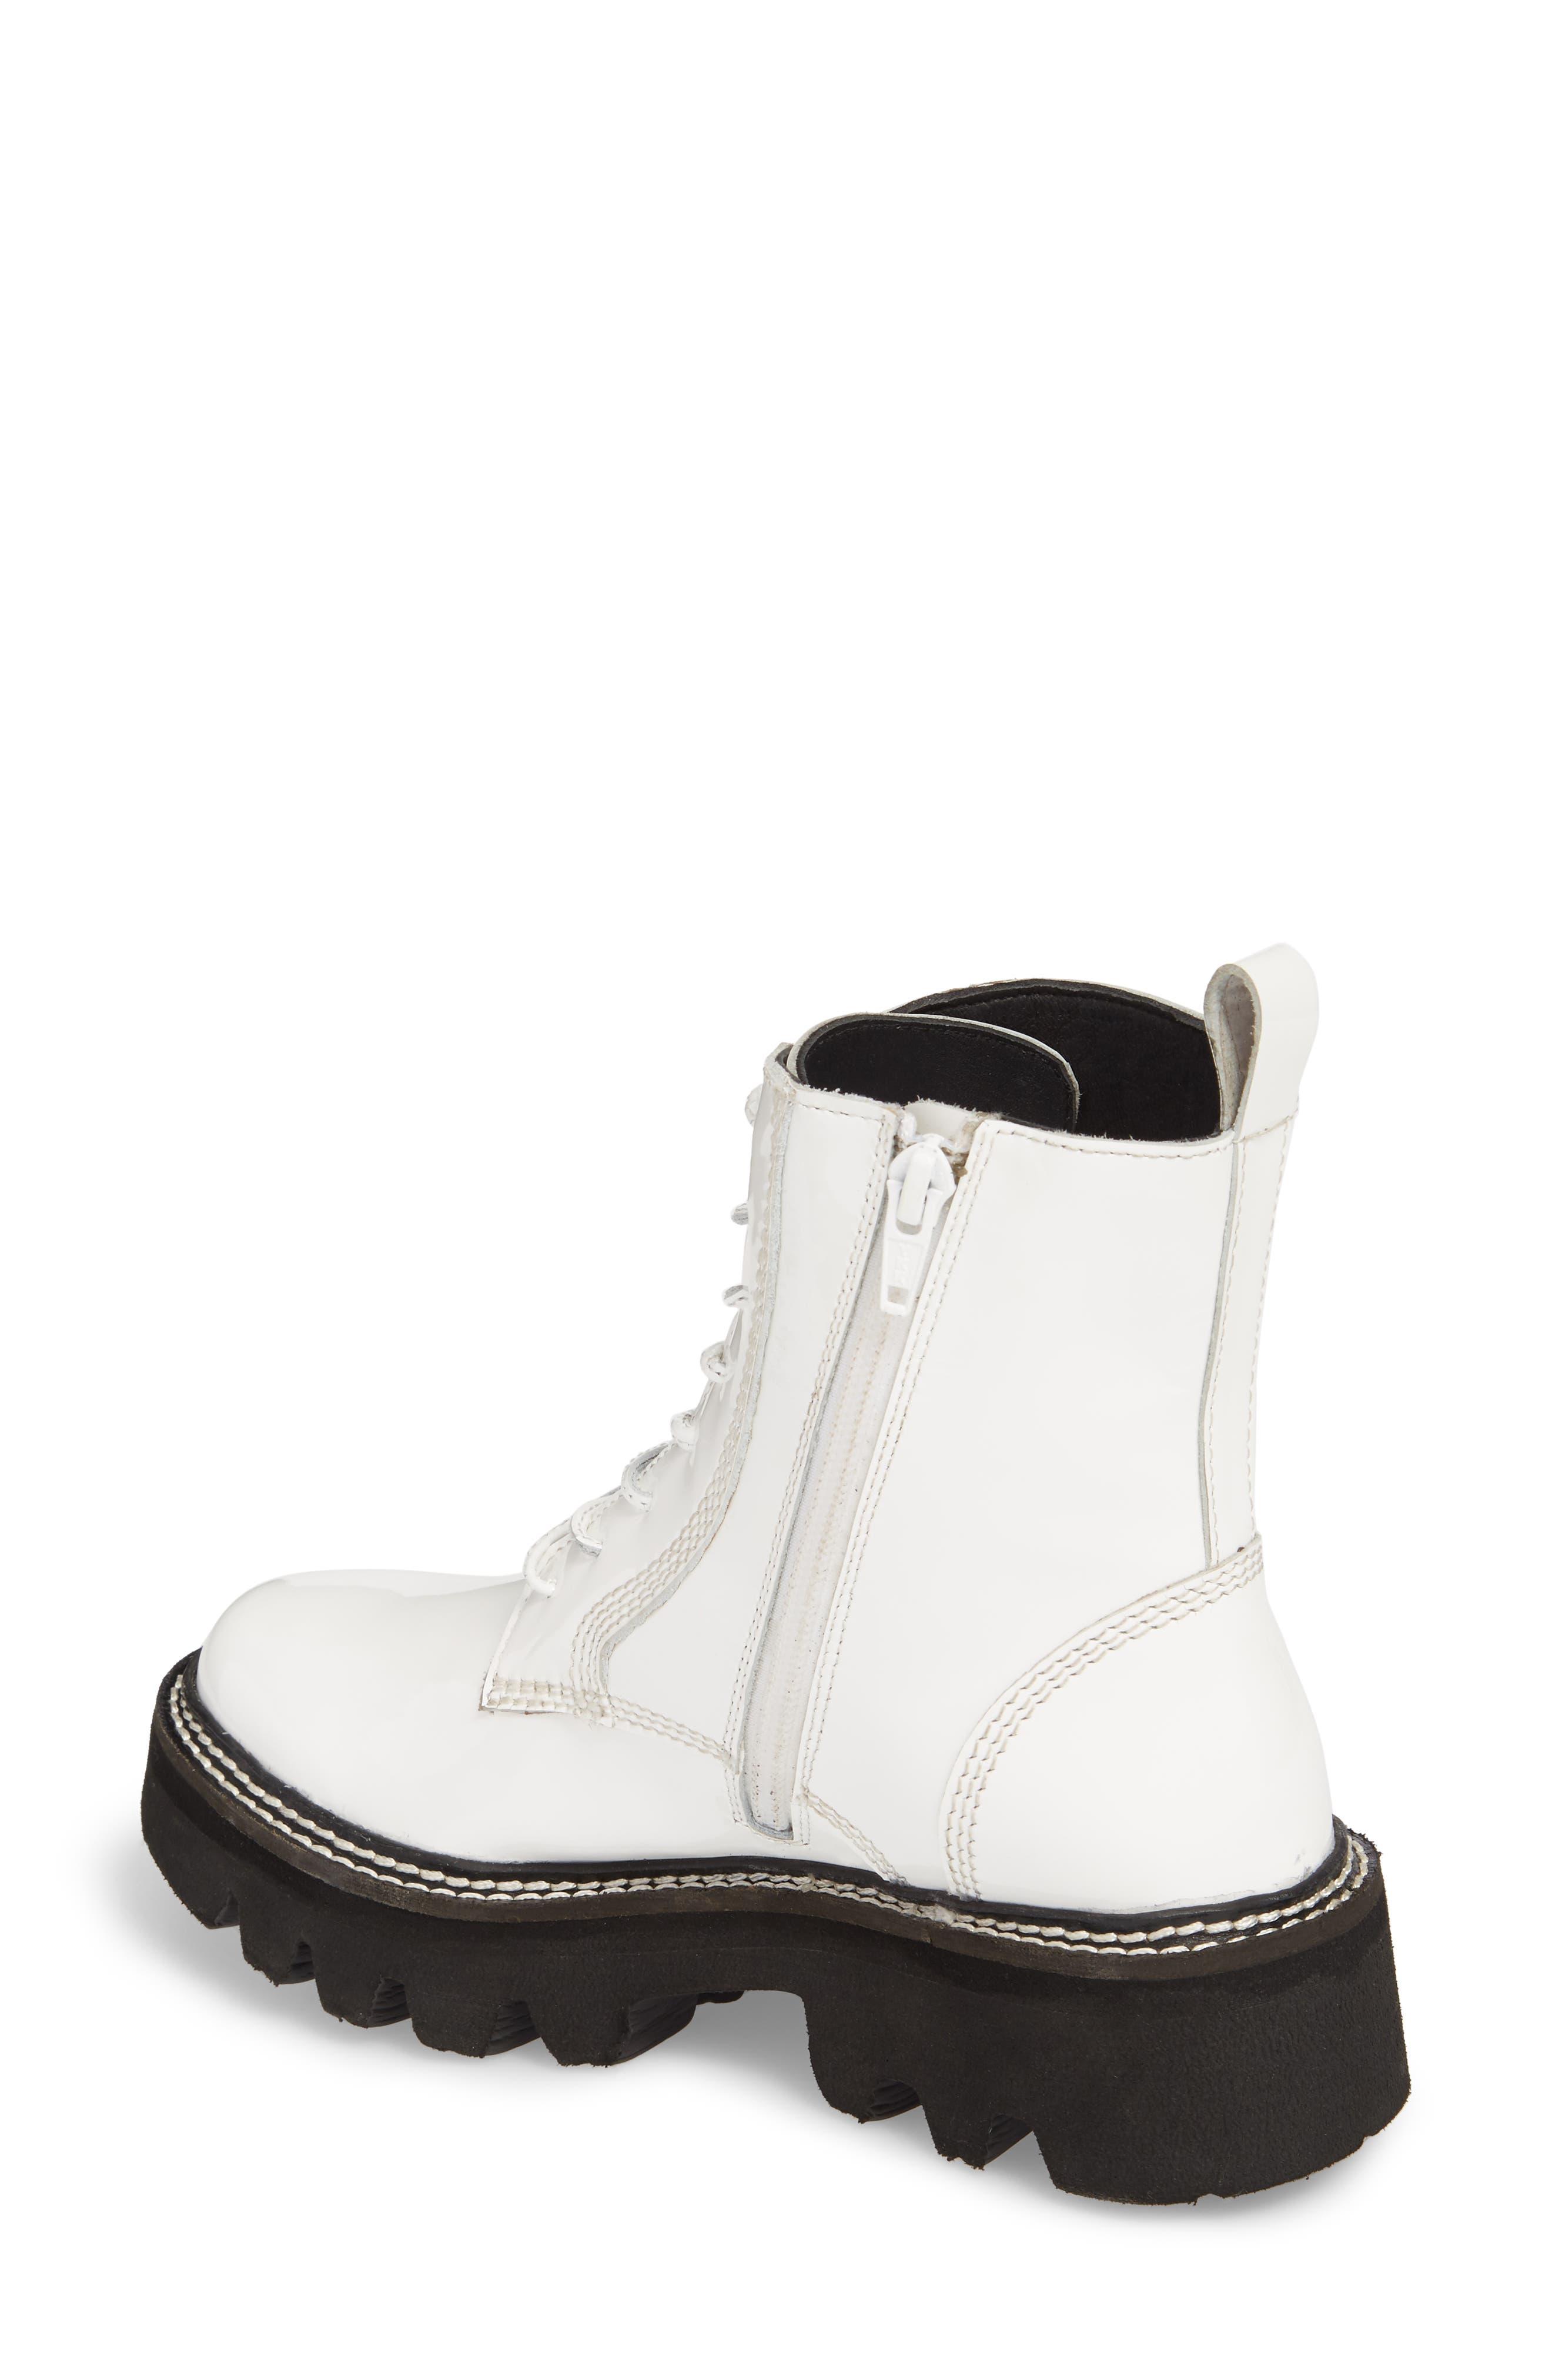 Agira Lug Boot,                             Alternate thumbnail 2, color,                             White Patent Leather